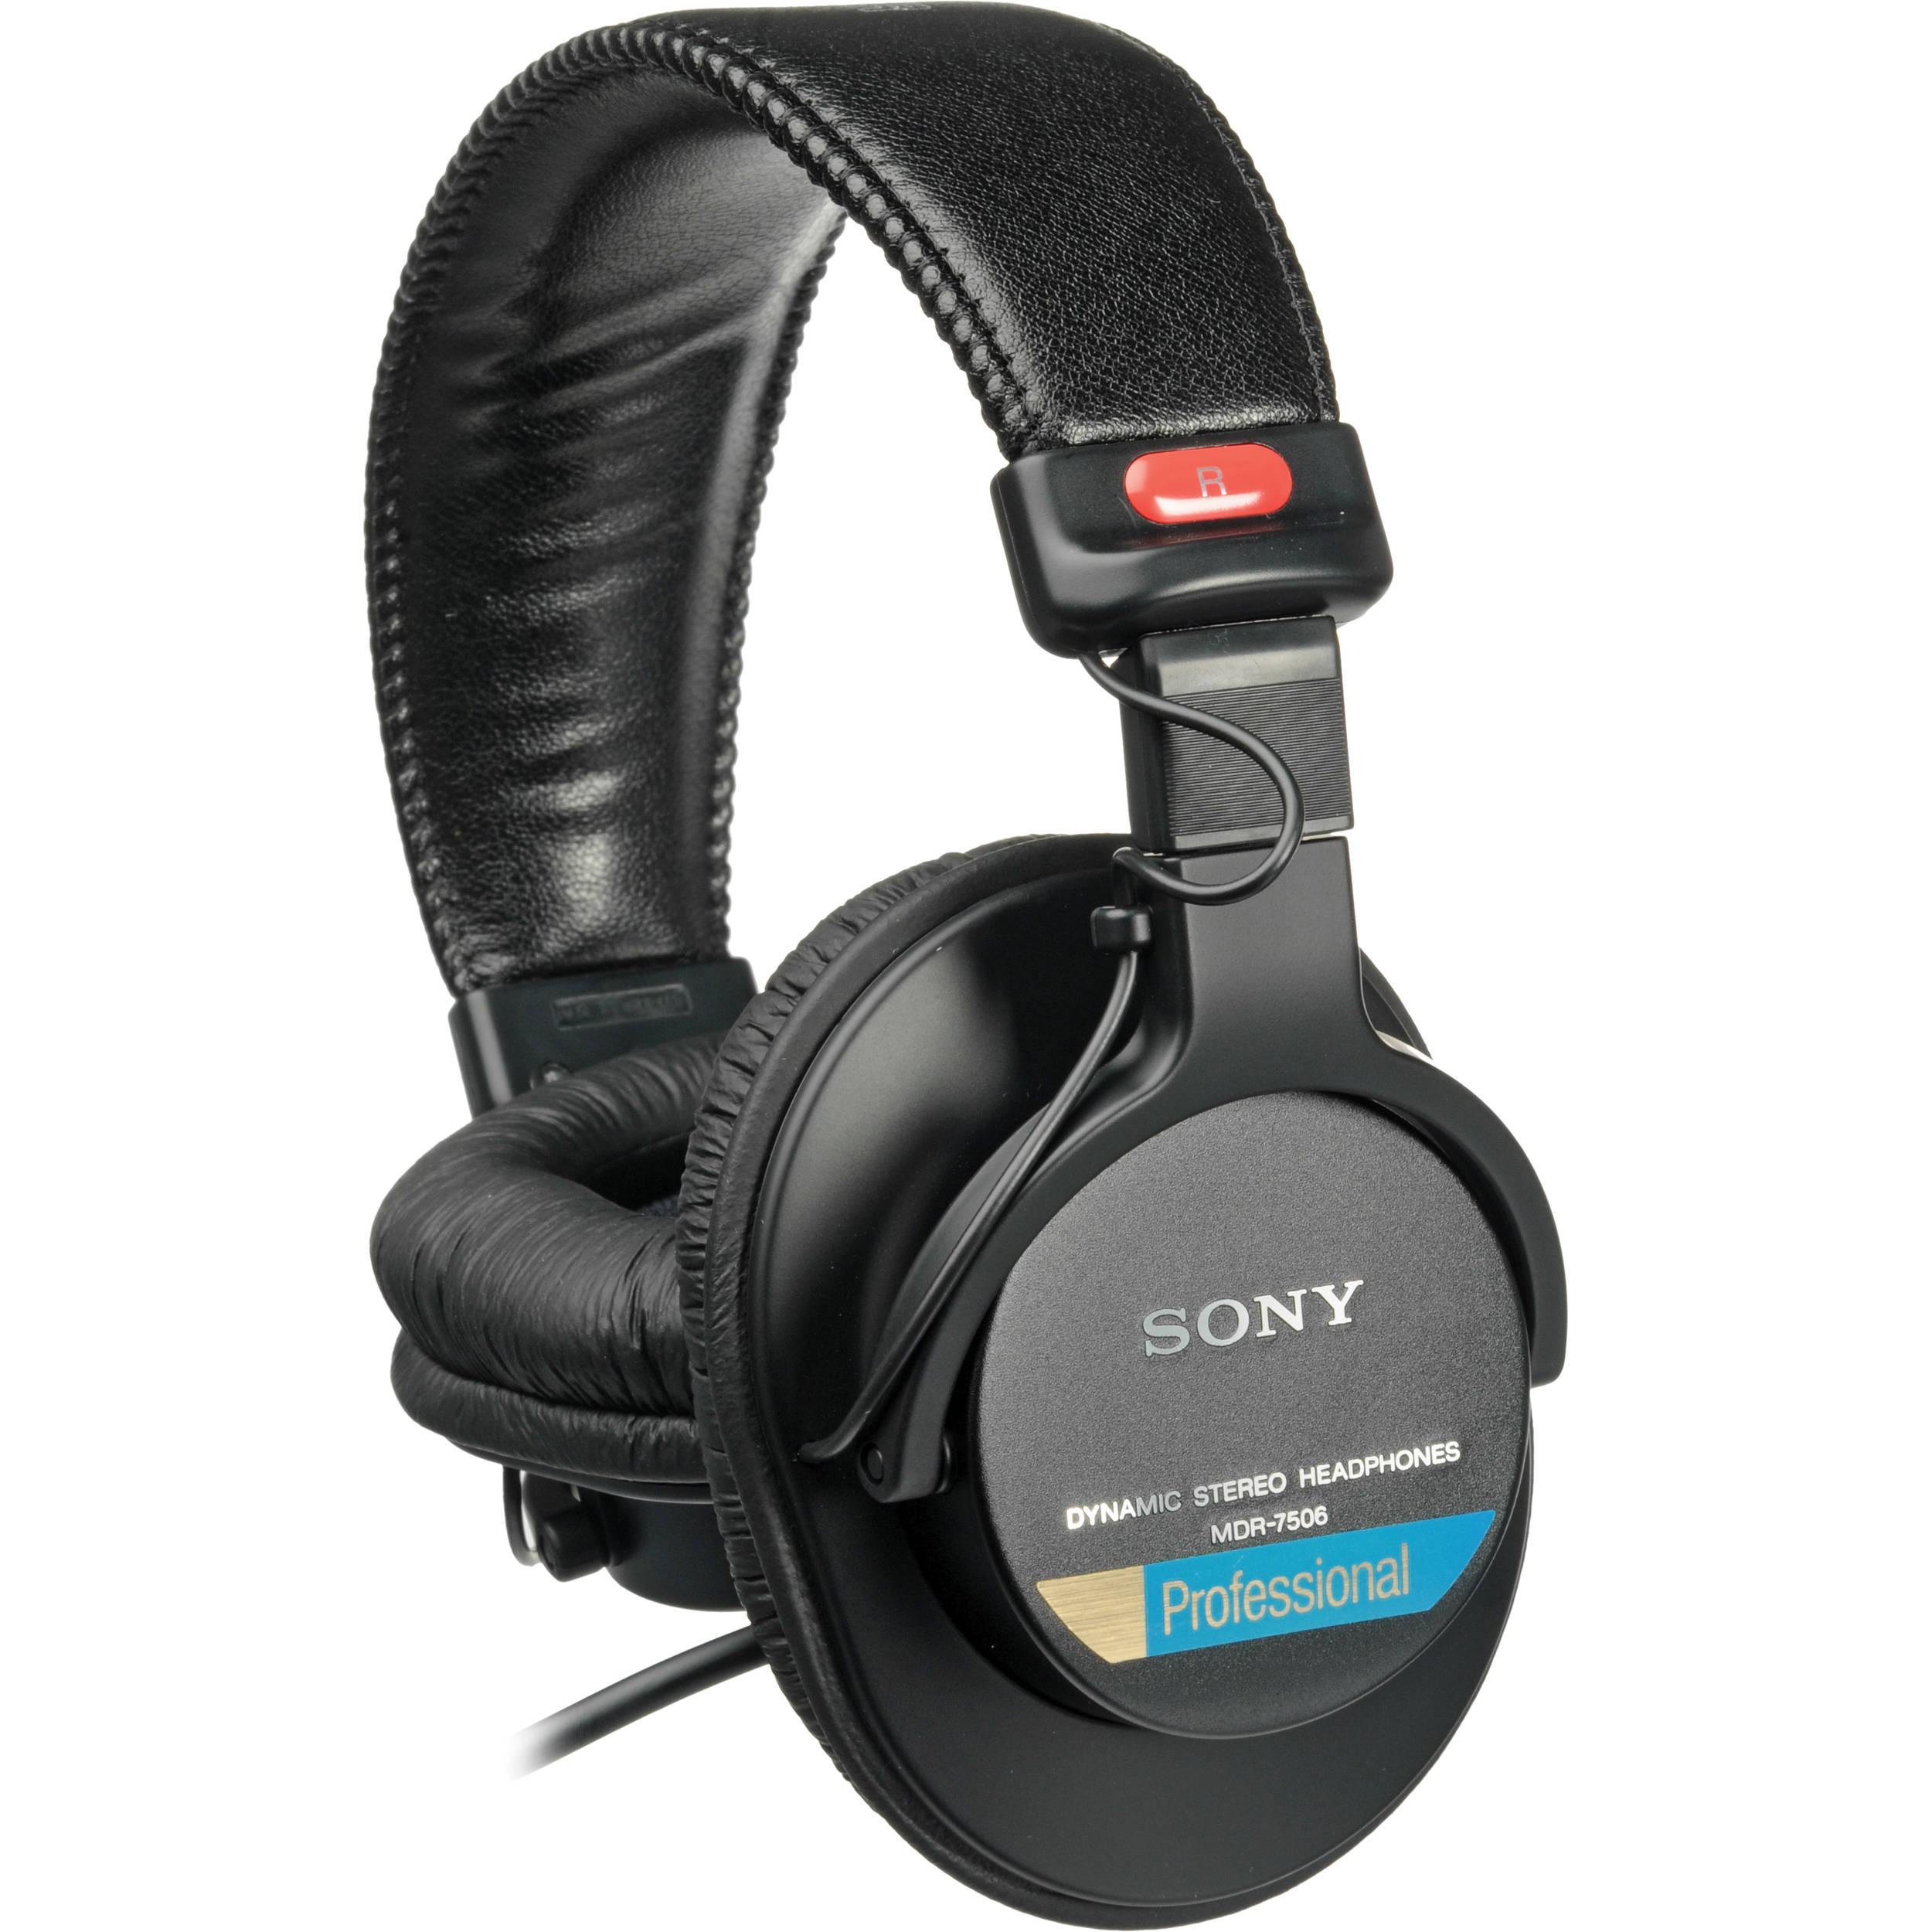 Sony MDR-7506 Dynamic Stereo Headphones